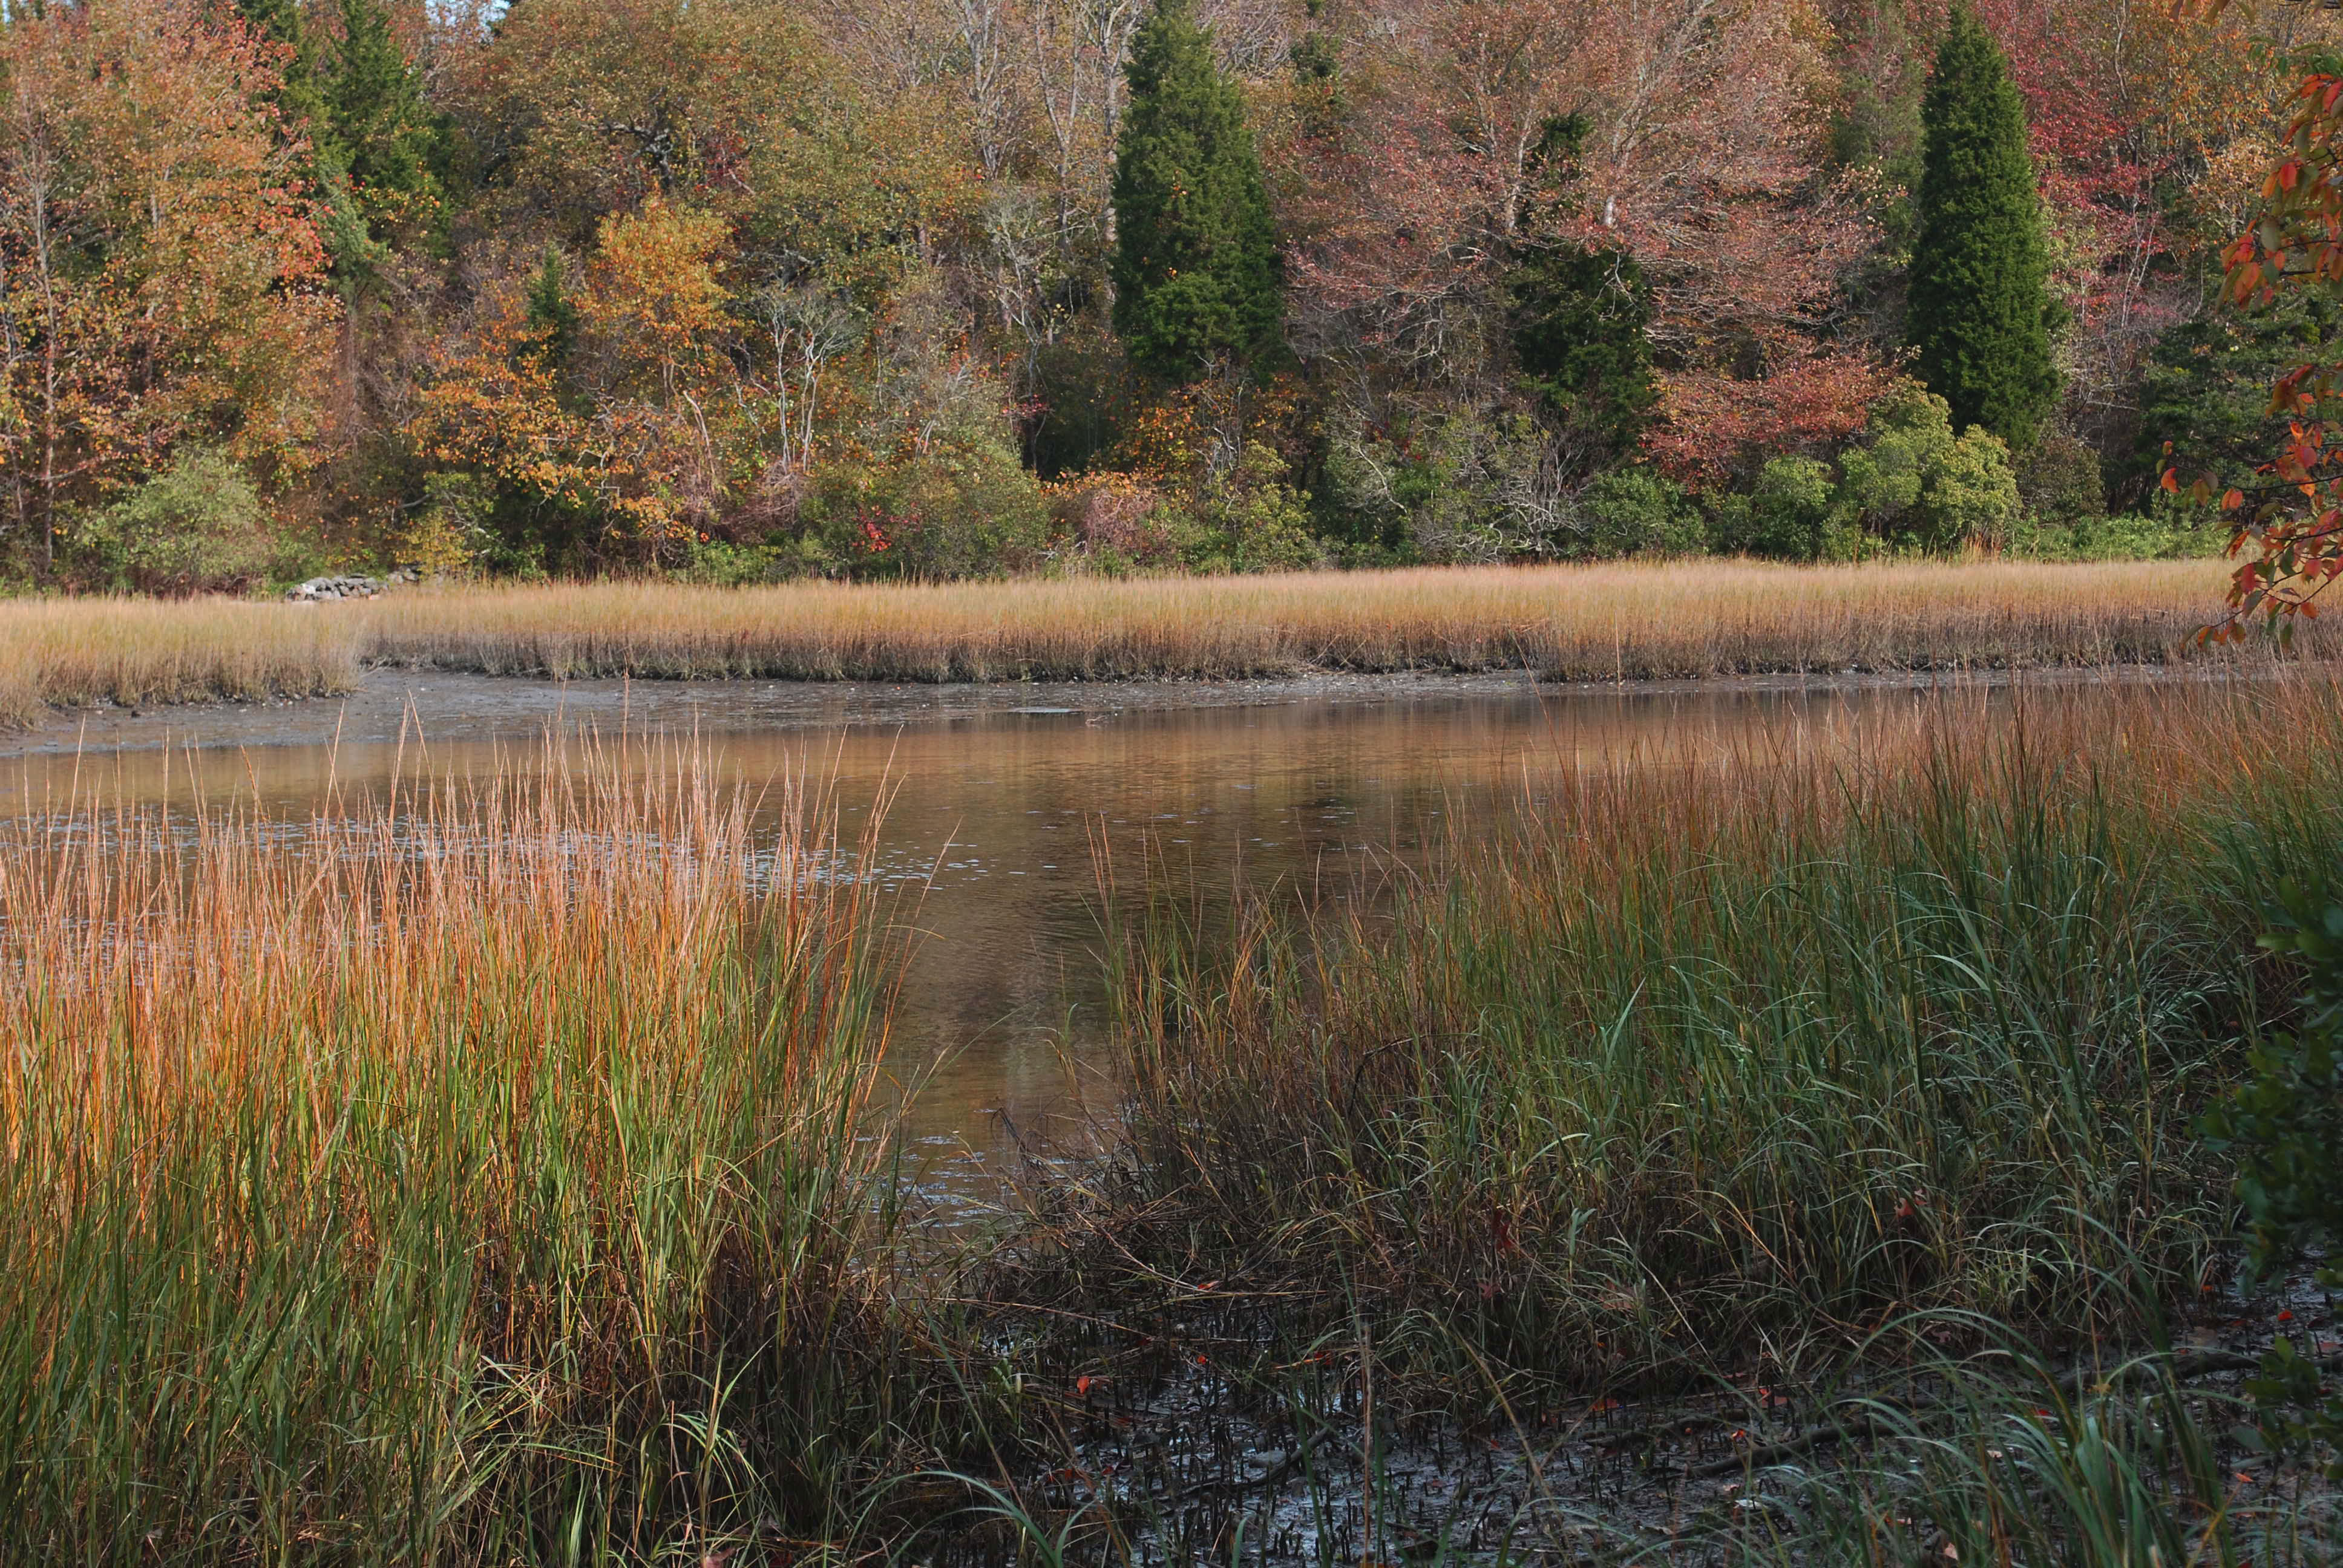 Emilie Ruecker Wildlife Refuge Tiverton Audubon Society of Rhode Island Hike Salt Marsh Environment Birds Birdwatching